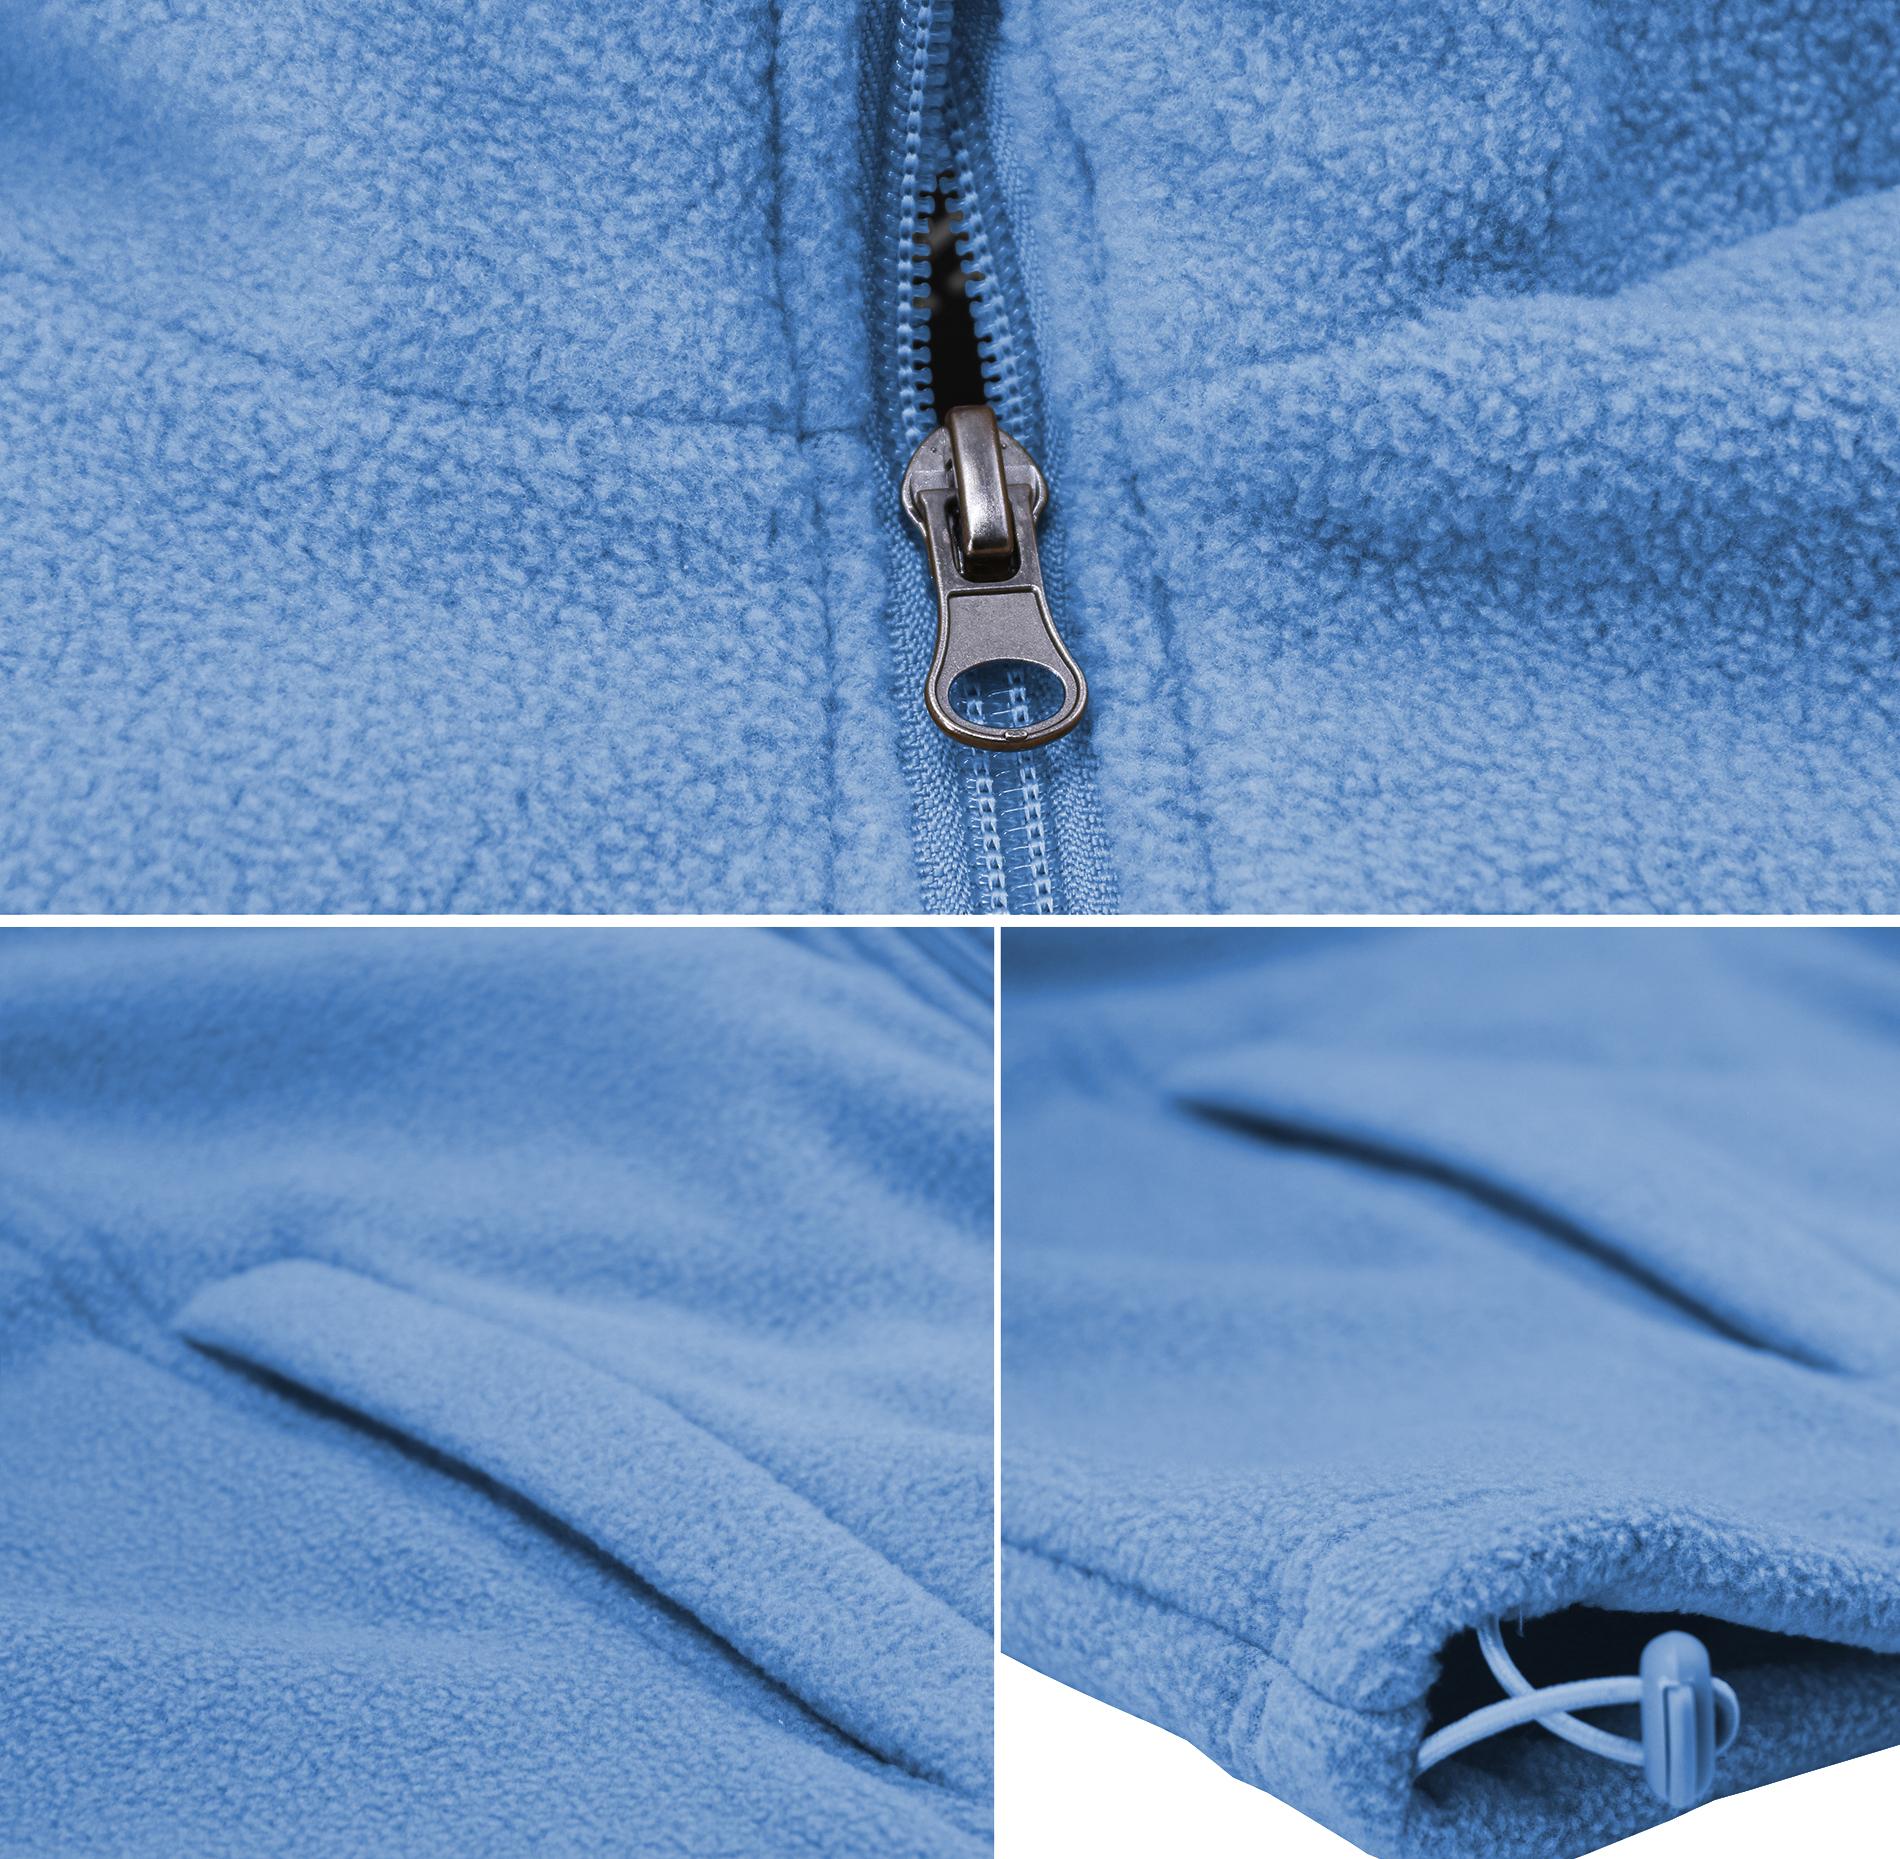 miniature 10 - Men-039-s-Polar-Fleece-Lightweight-Warm-Jacket-Collared-Full-Zip-Up-Sweater-Vest